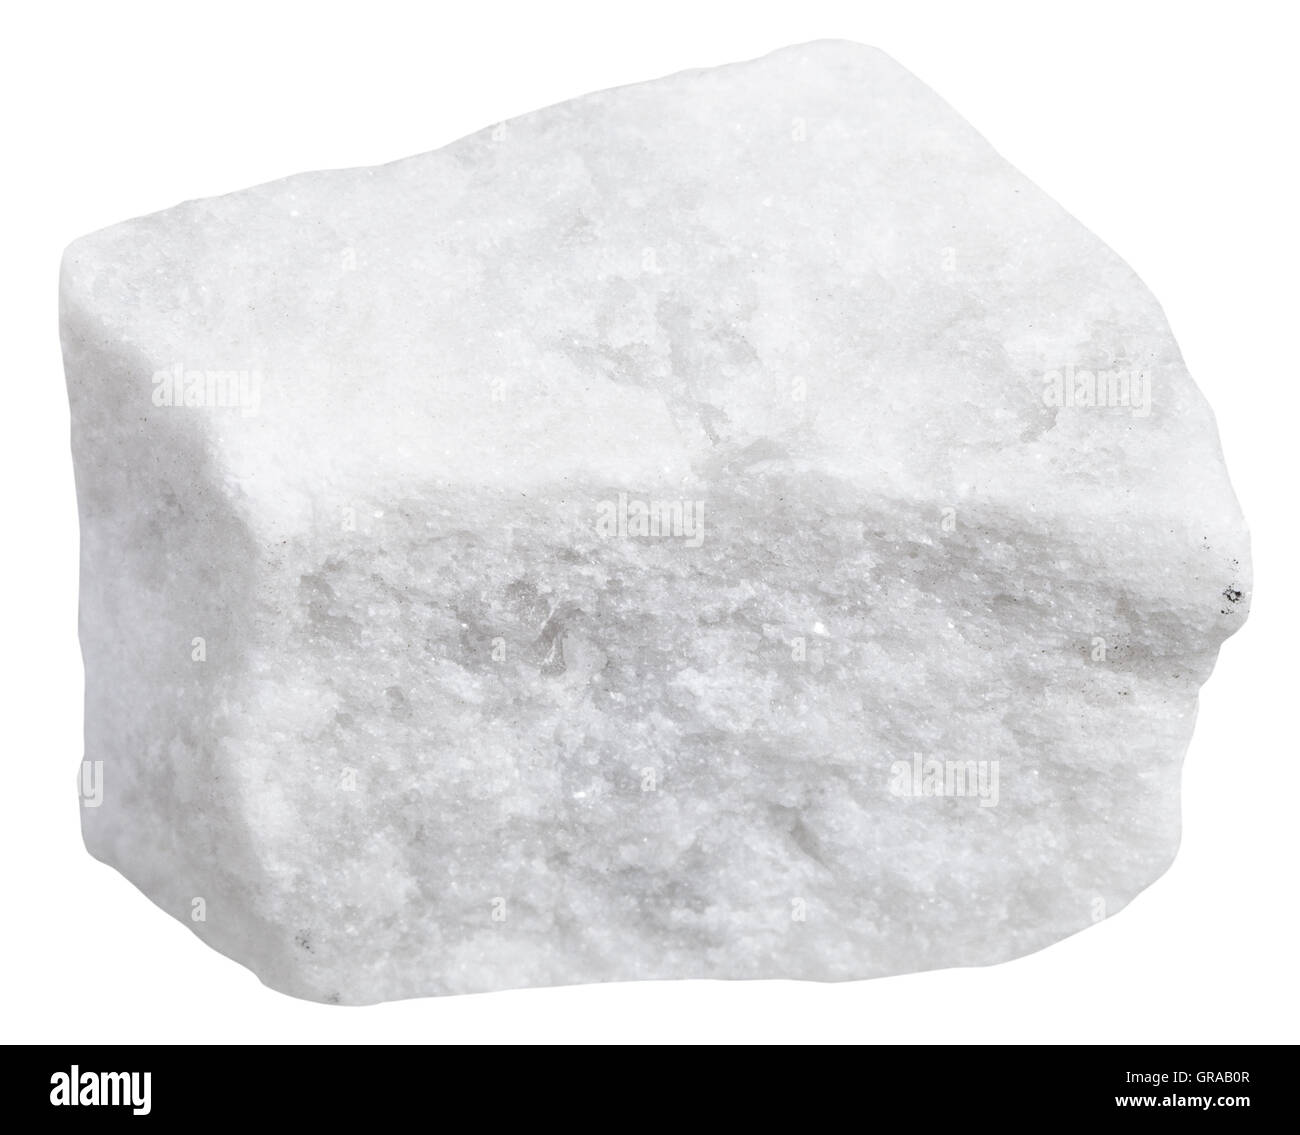 White Marble Rock : Macro shooting of metamorphic rock specimens piece